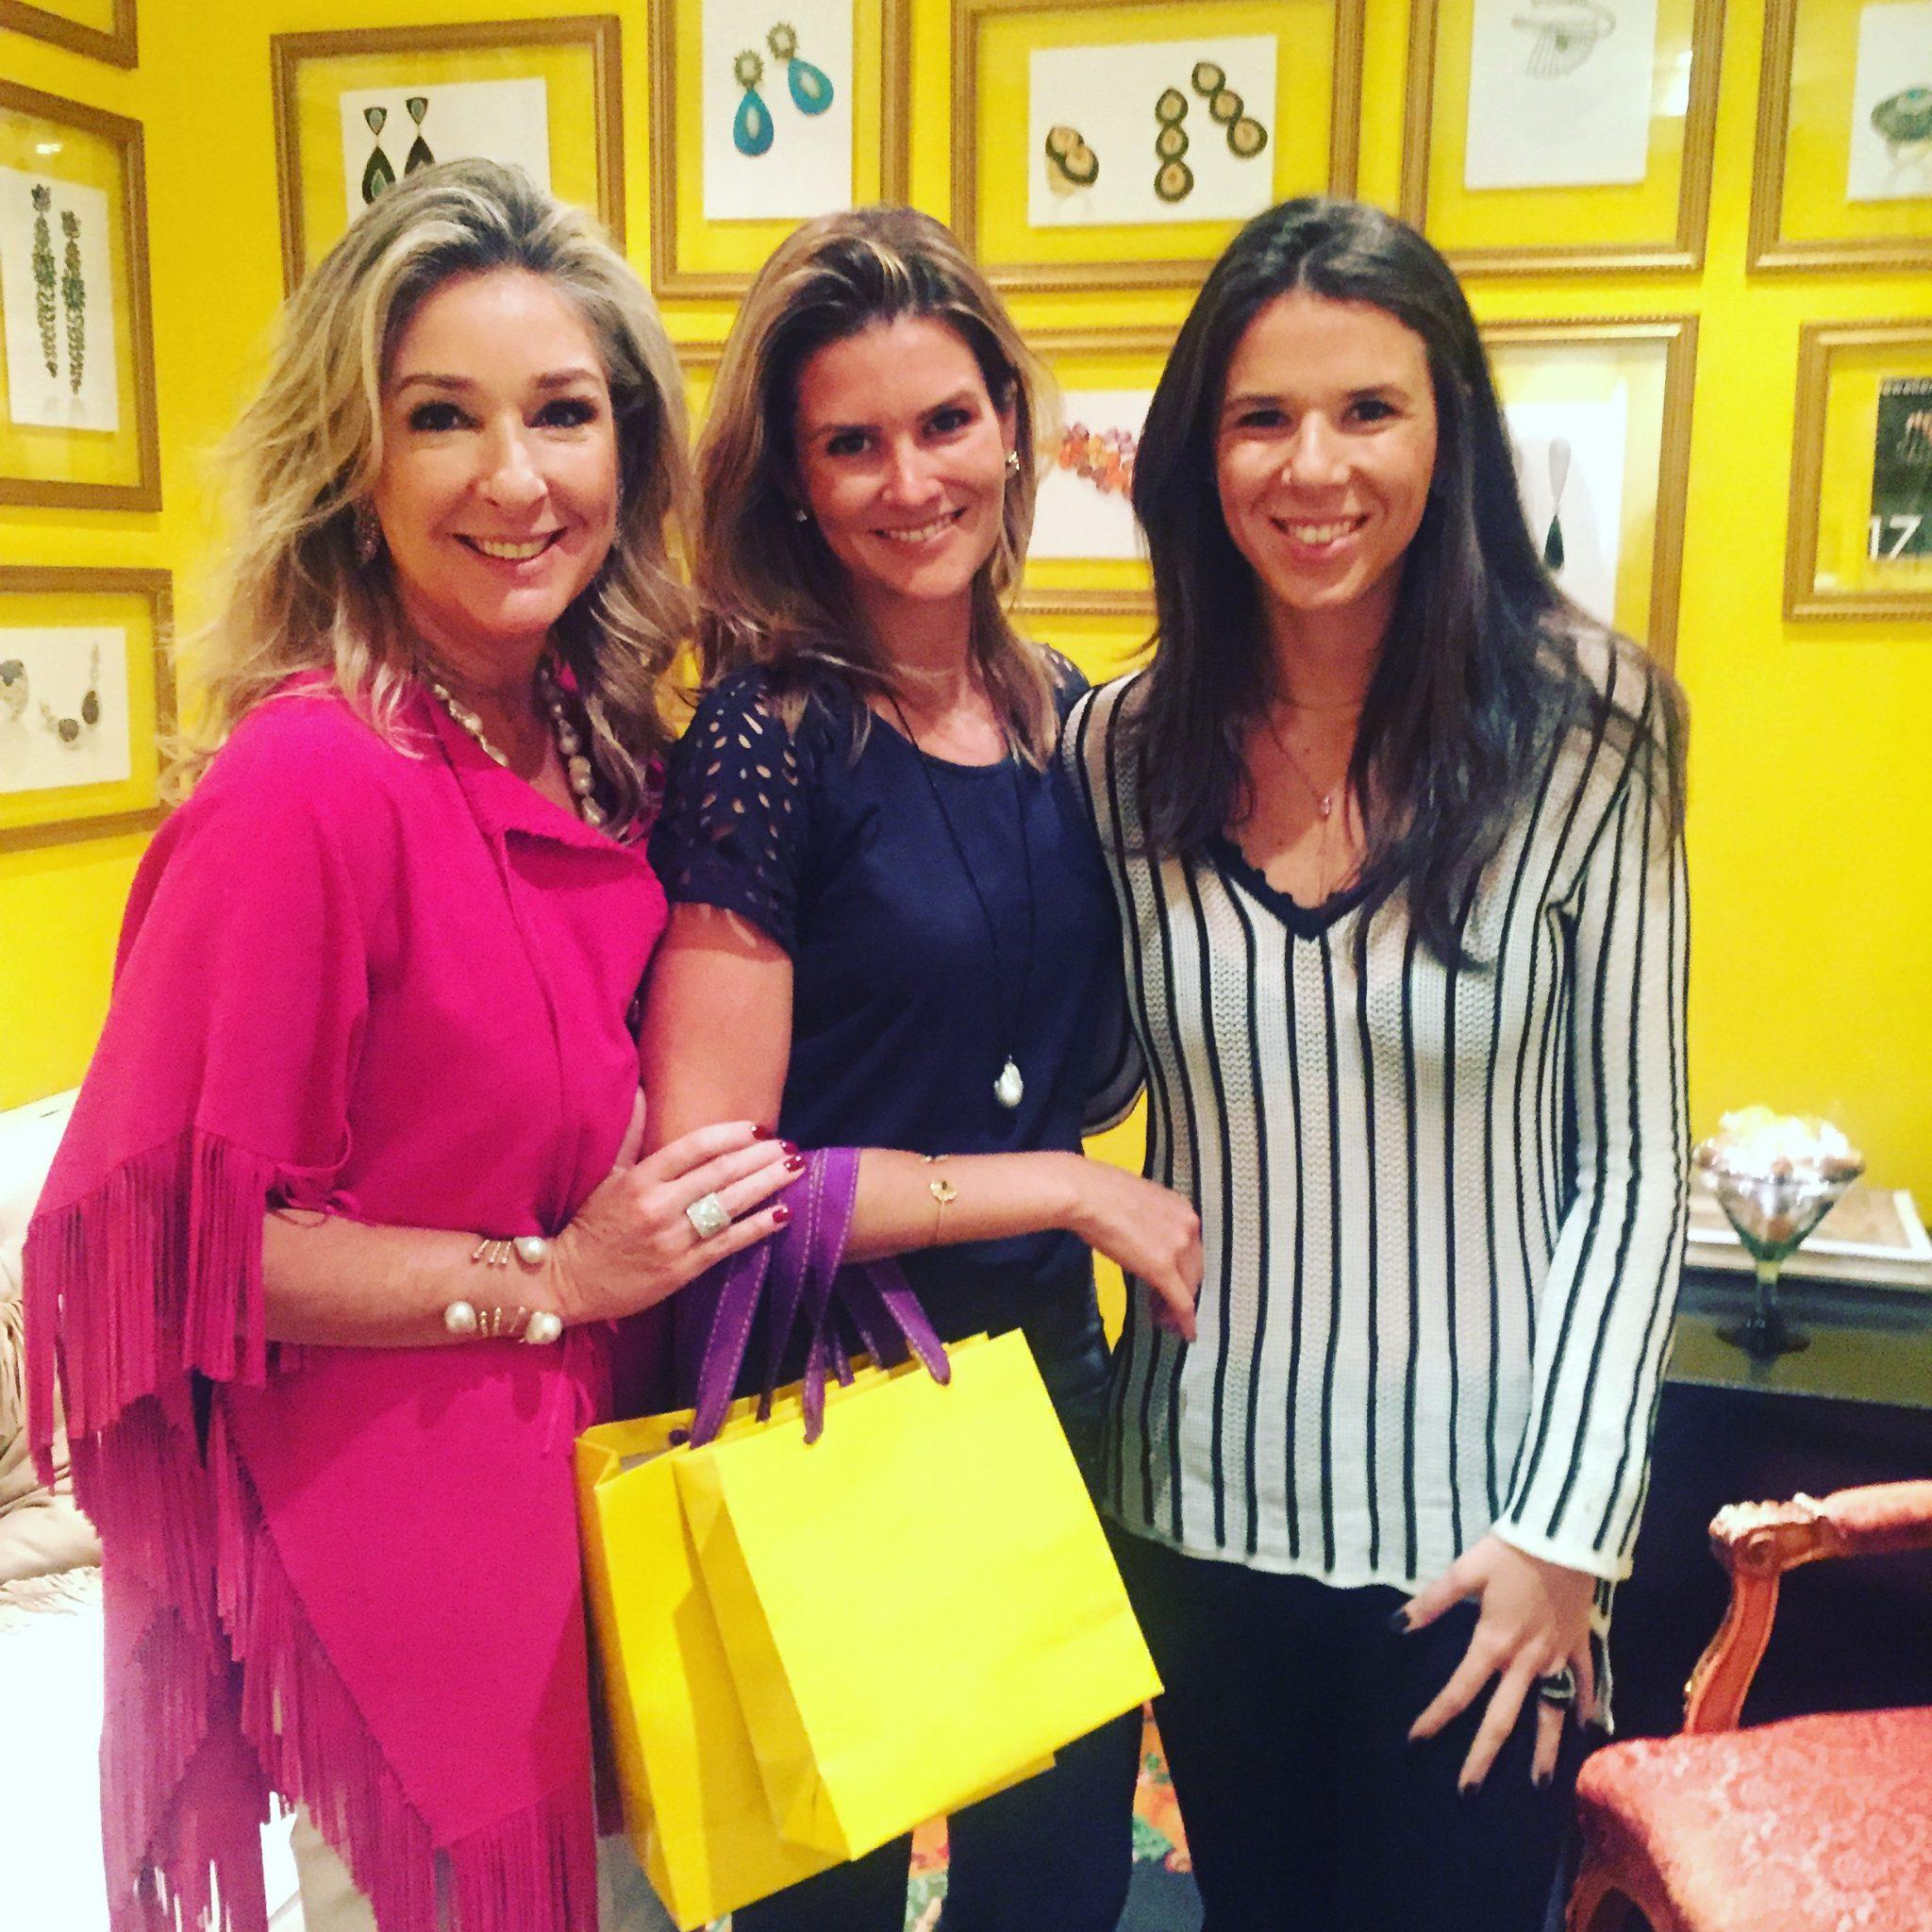 Letícia, Renata Batti Ferro e Marcela Linton